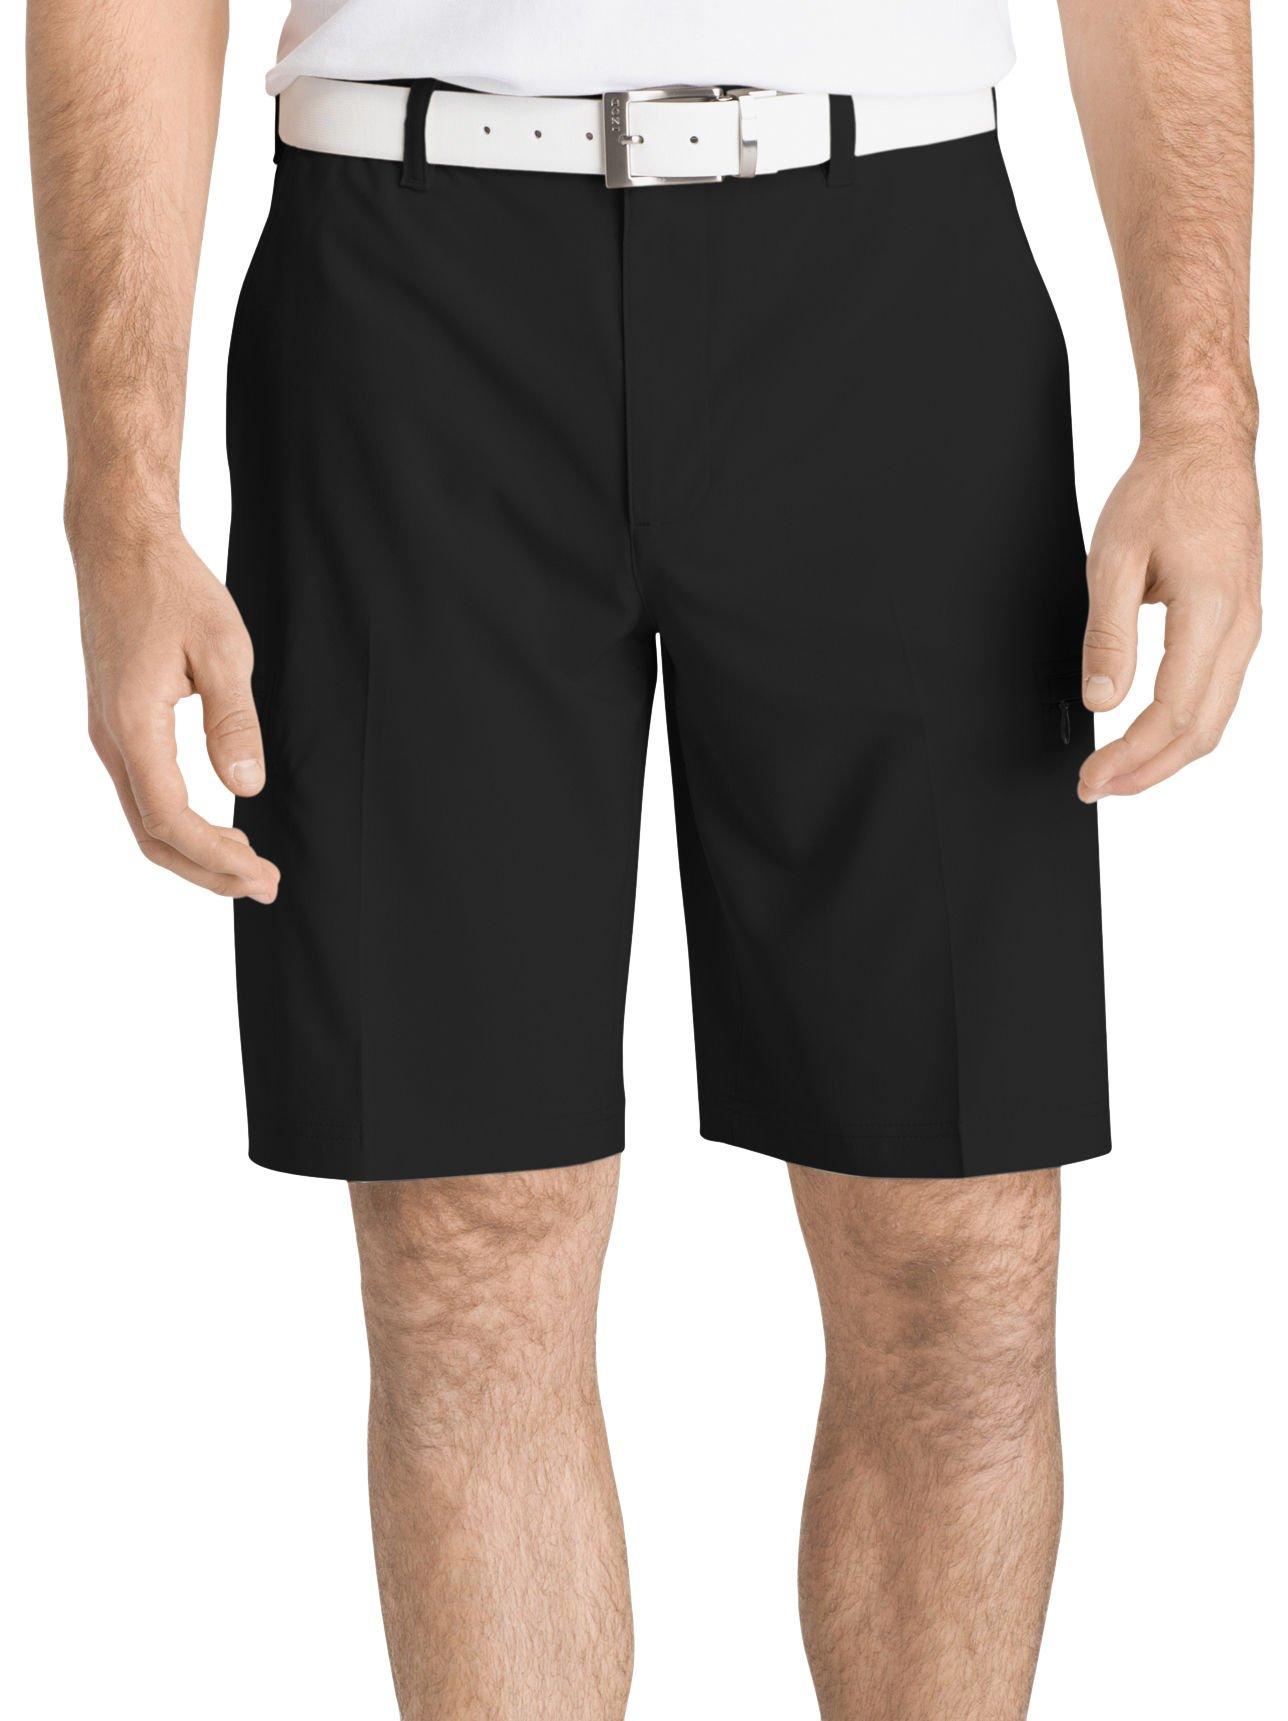 IZOD Men's Golf Swing Flex Cargo Short, Black, 38